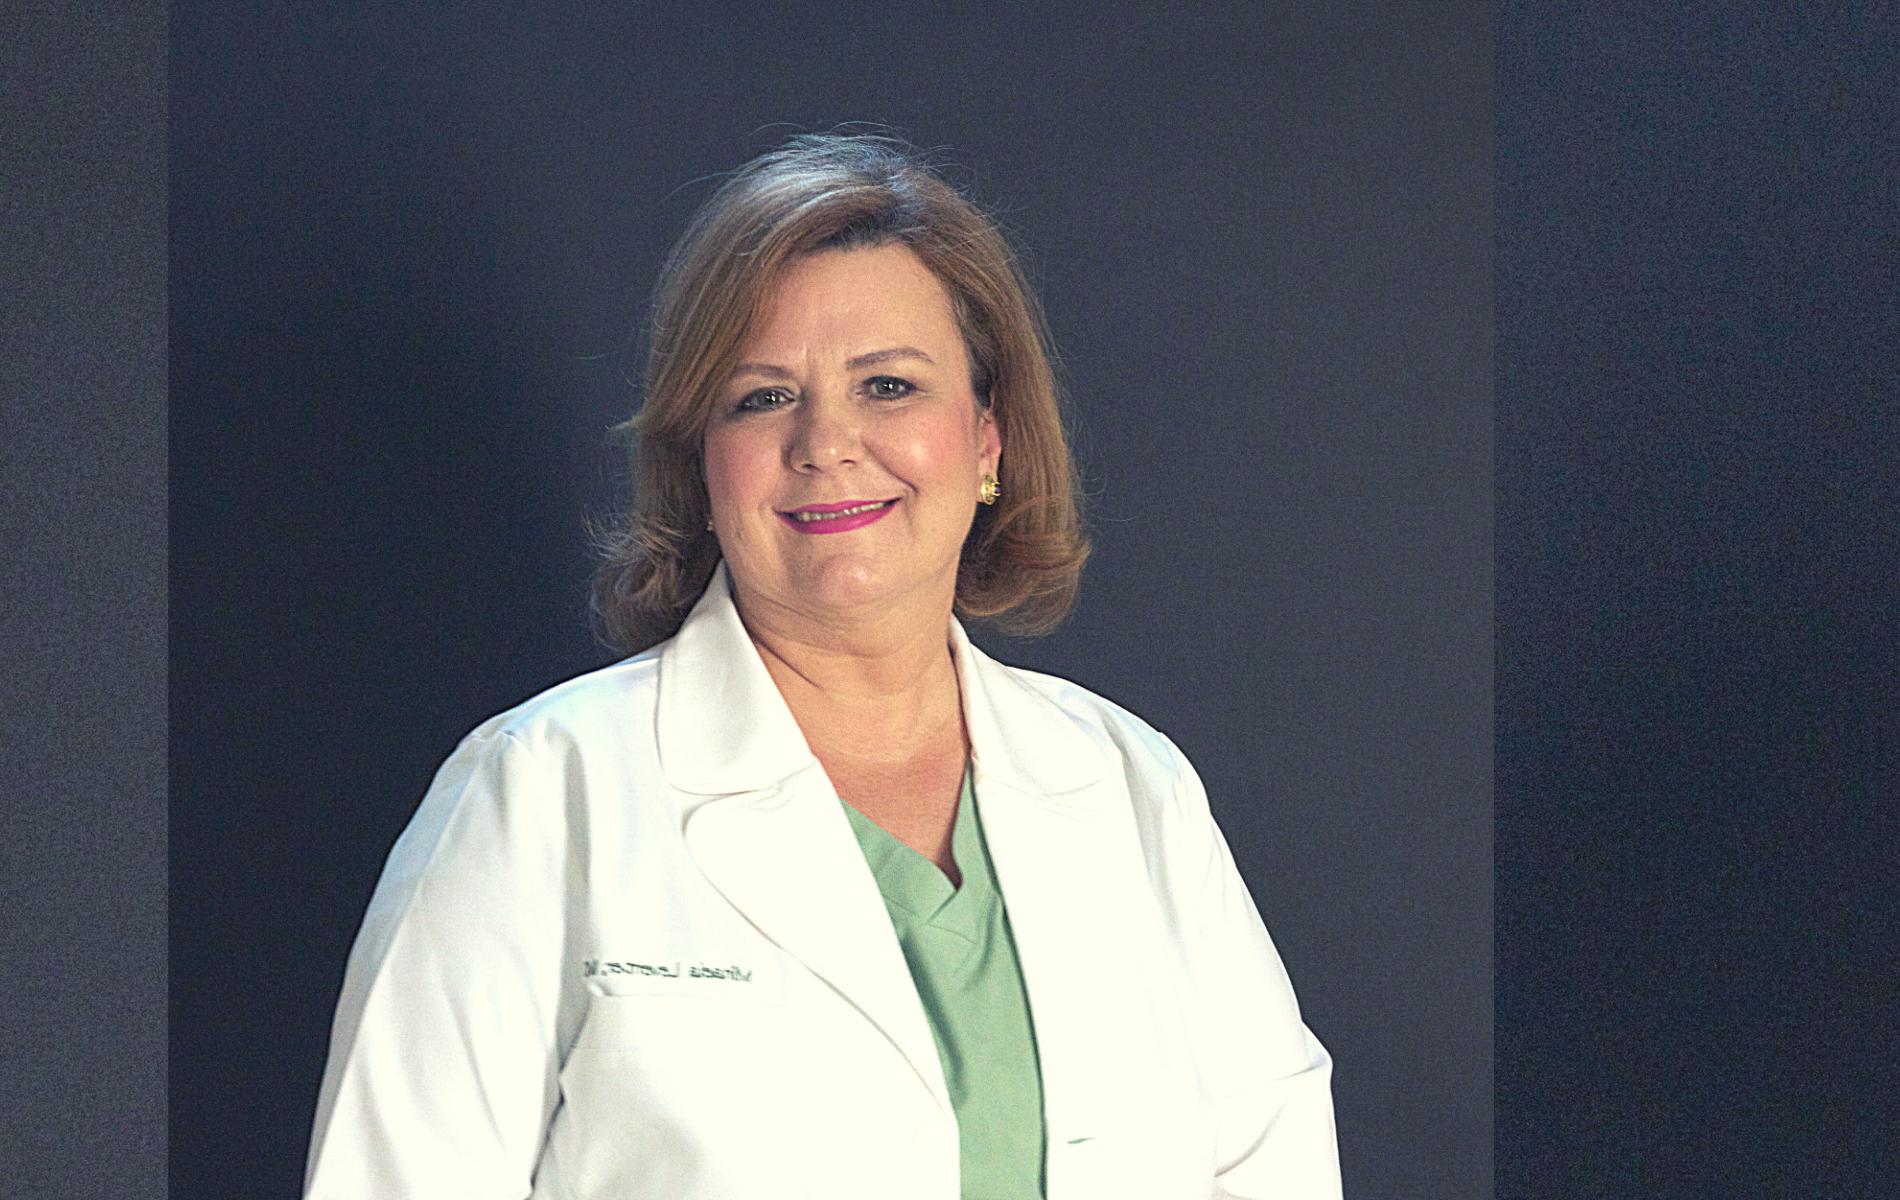 Dr Mihaela Leventer